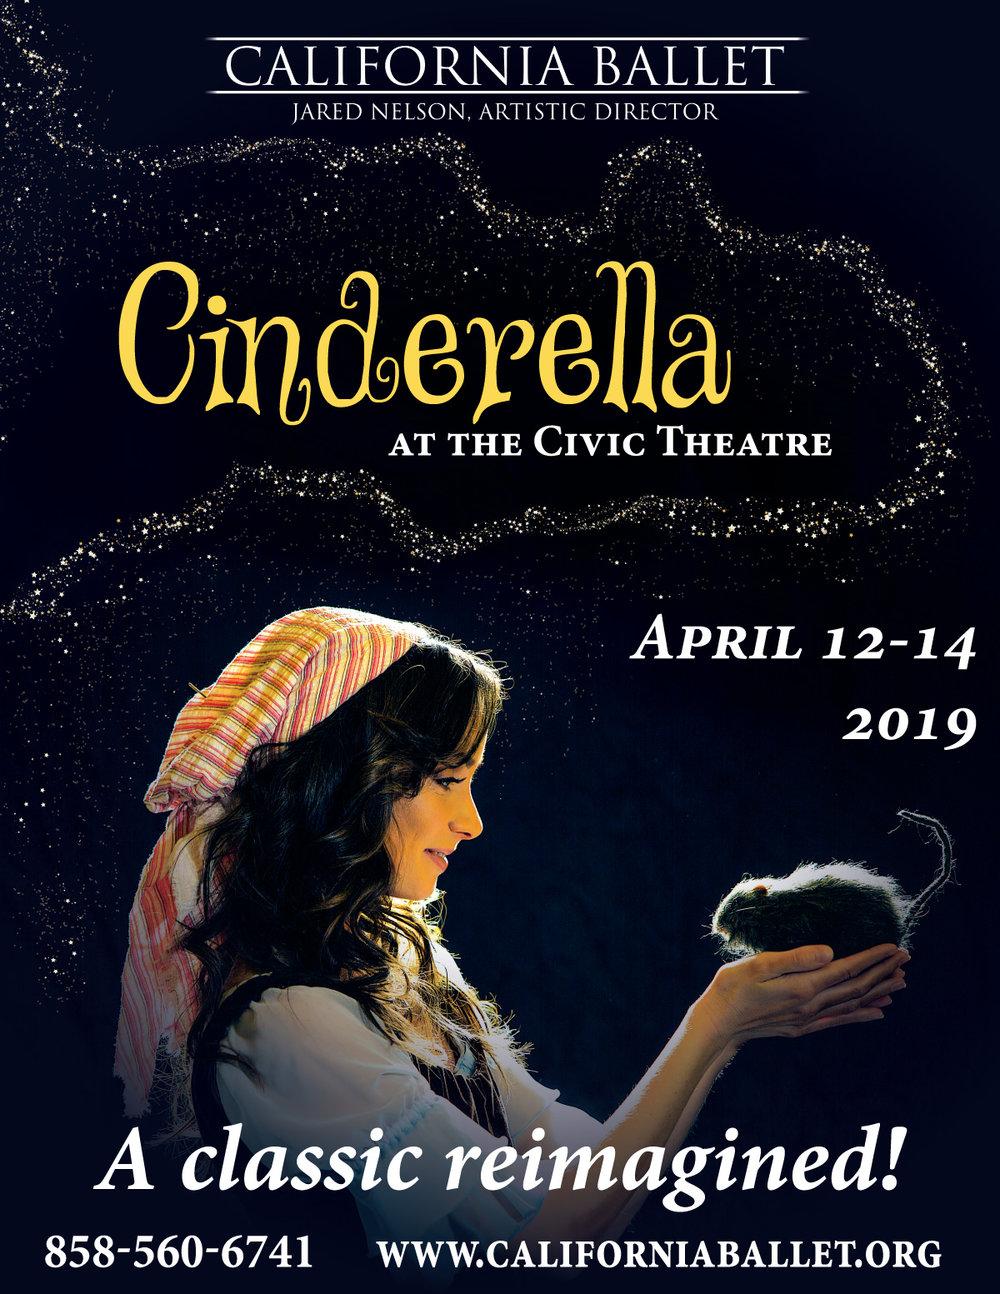 Cinderella-2019_California-Ballet-Company-San-Diego-Civic-Theatre.jpg